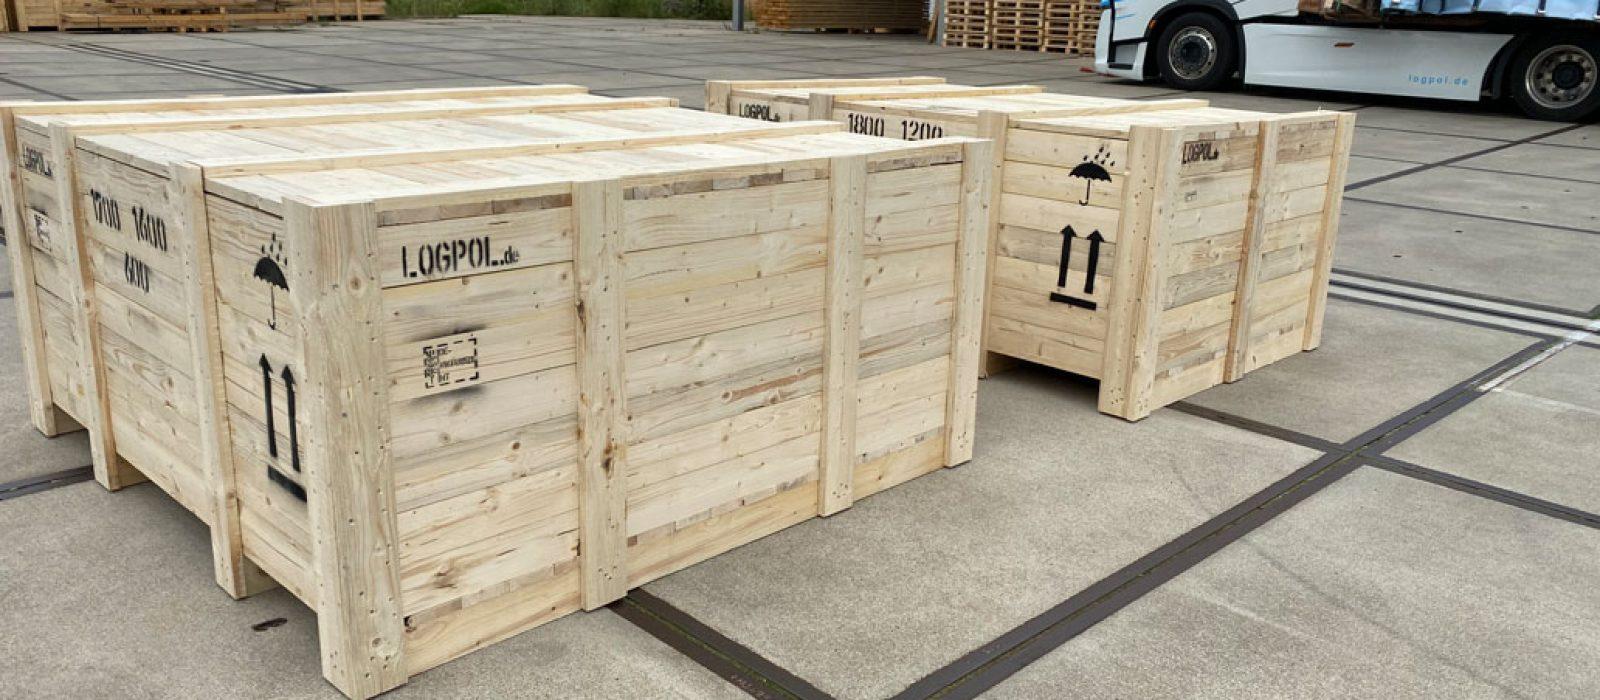 Kiste-1800×1200-LOGPOL